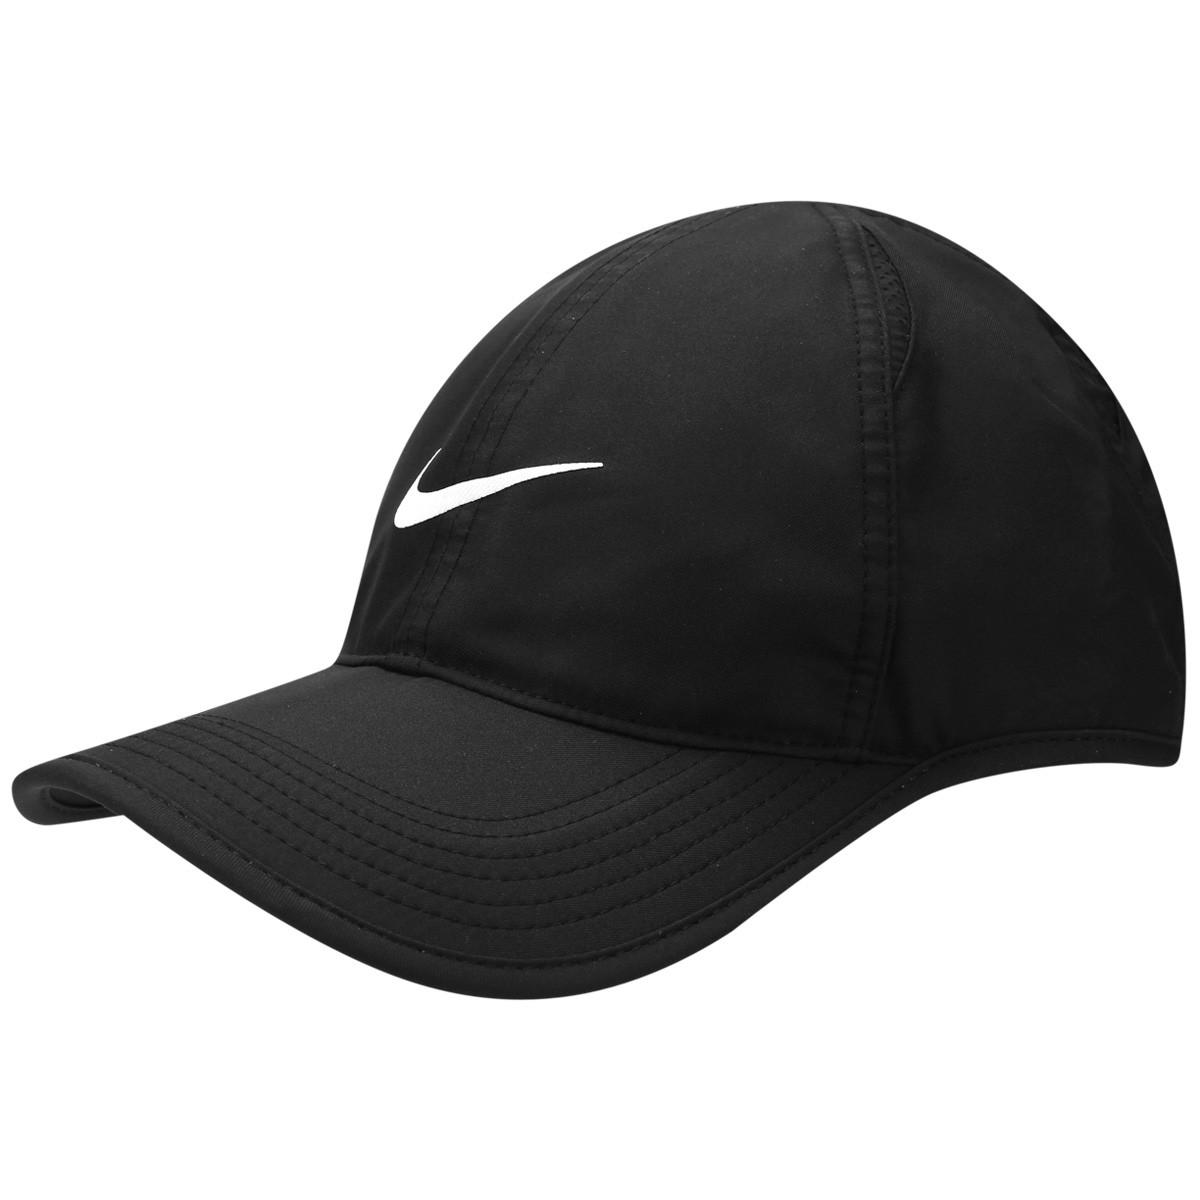 Boné Nike Featherlight Cap 679421-010 - Preto Branco - Botas Online ... 7cbd6f8daa6